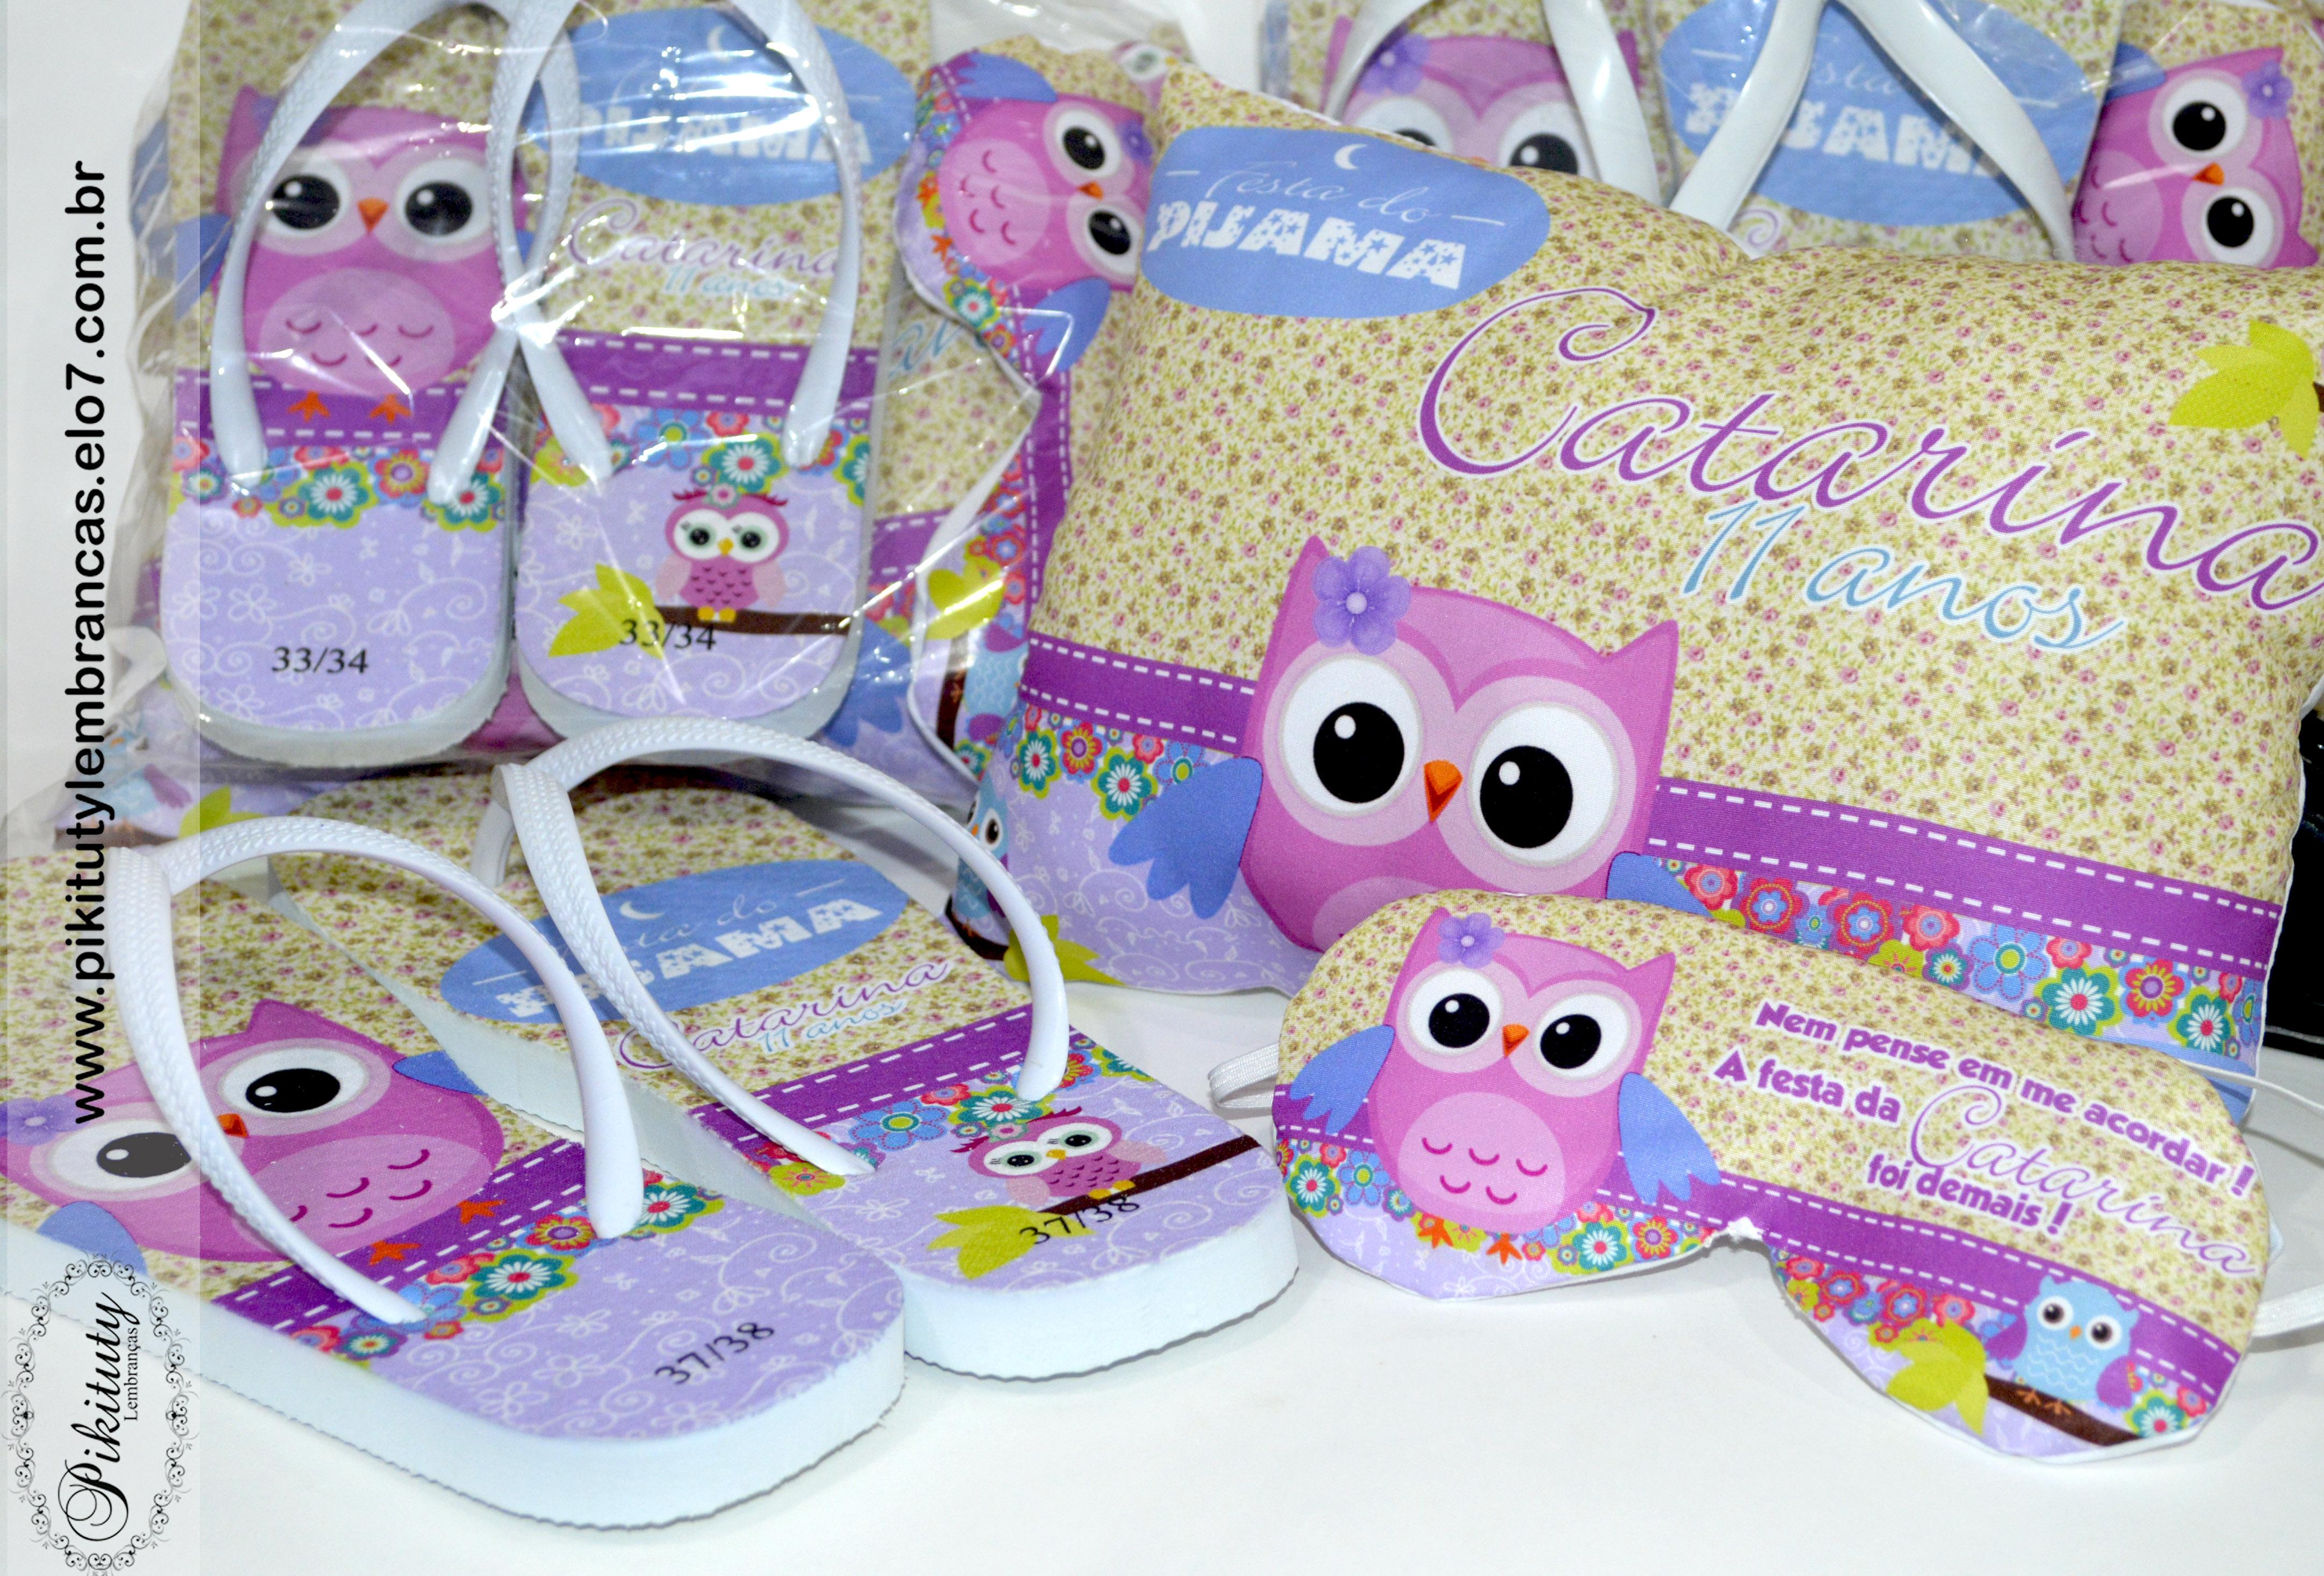 Lembrancinha Mini Tubete Tubo de Ensaio Festa do Pijama 10 unidades